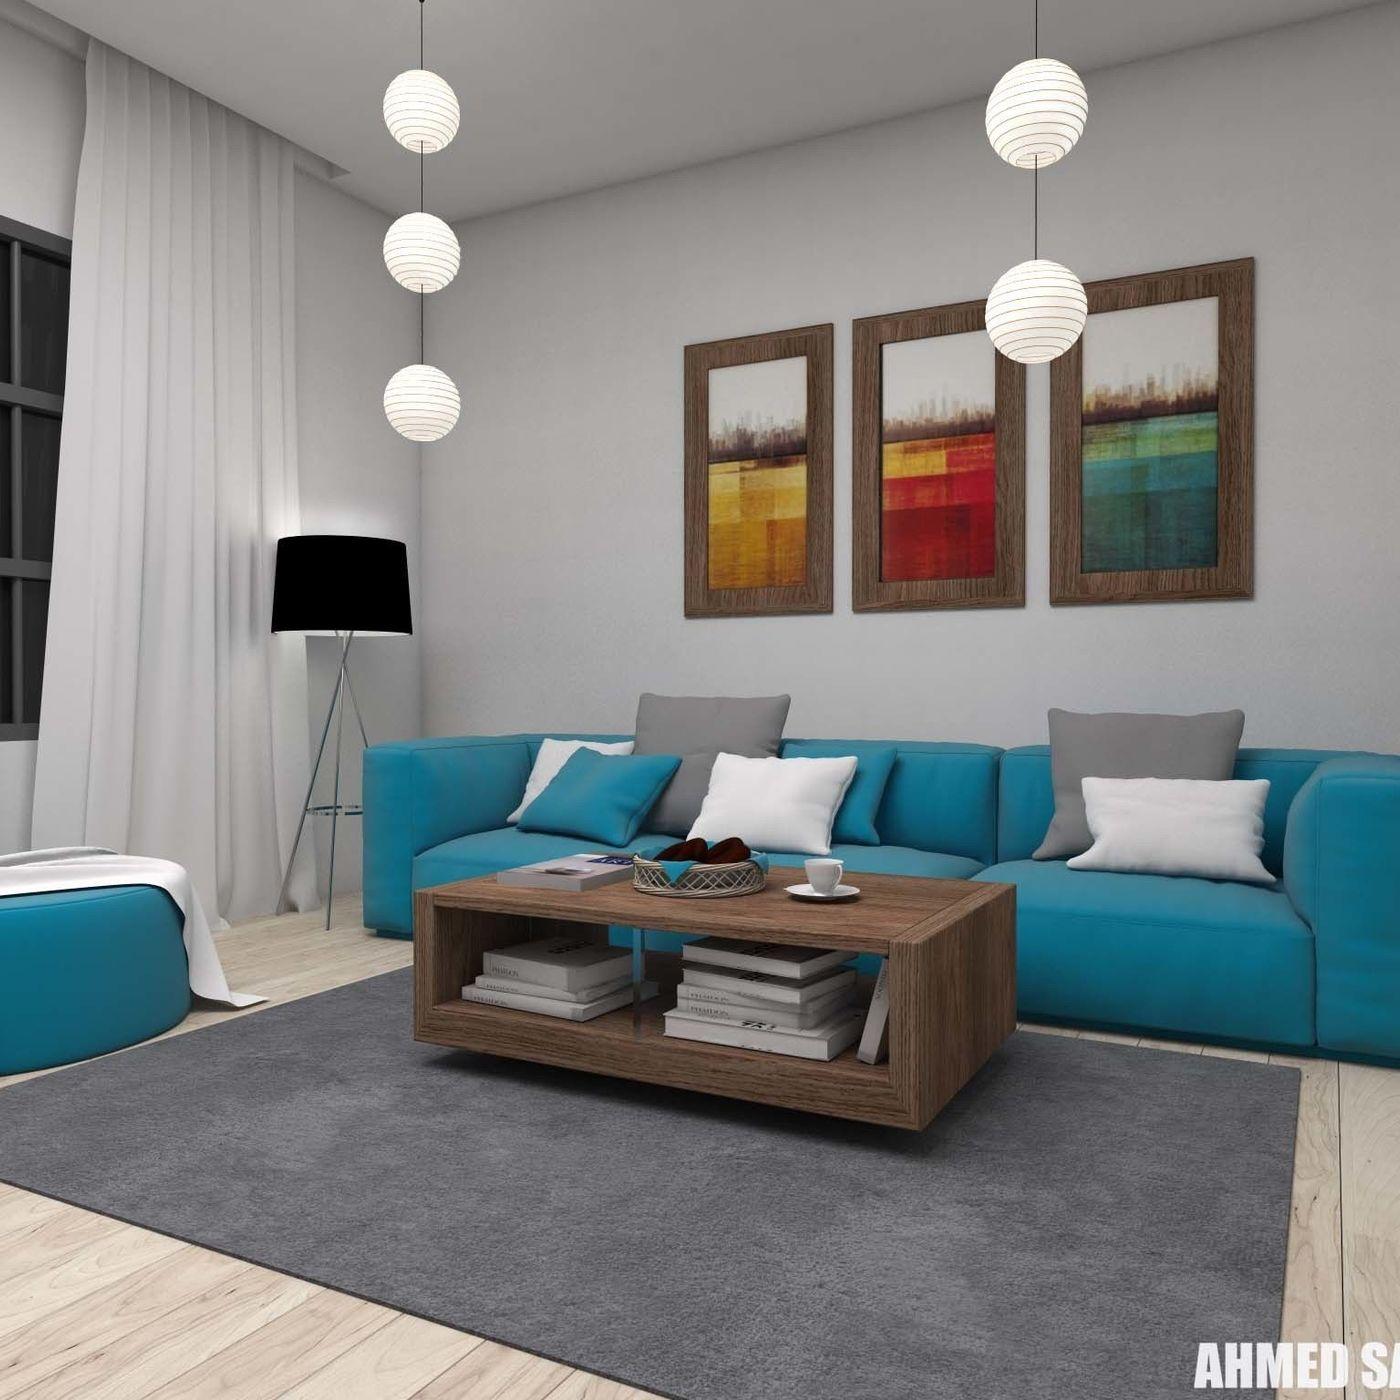 Design Of Living Area